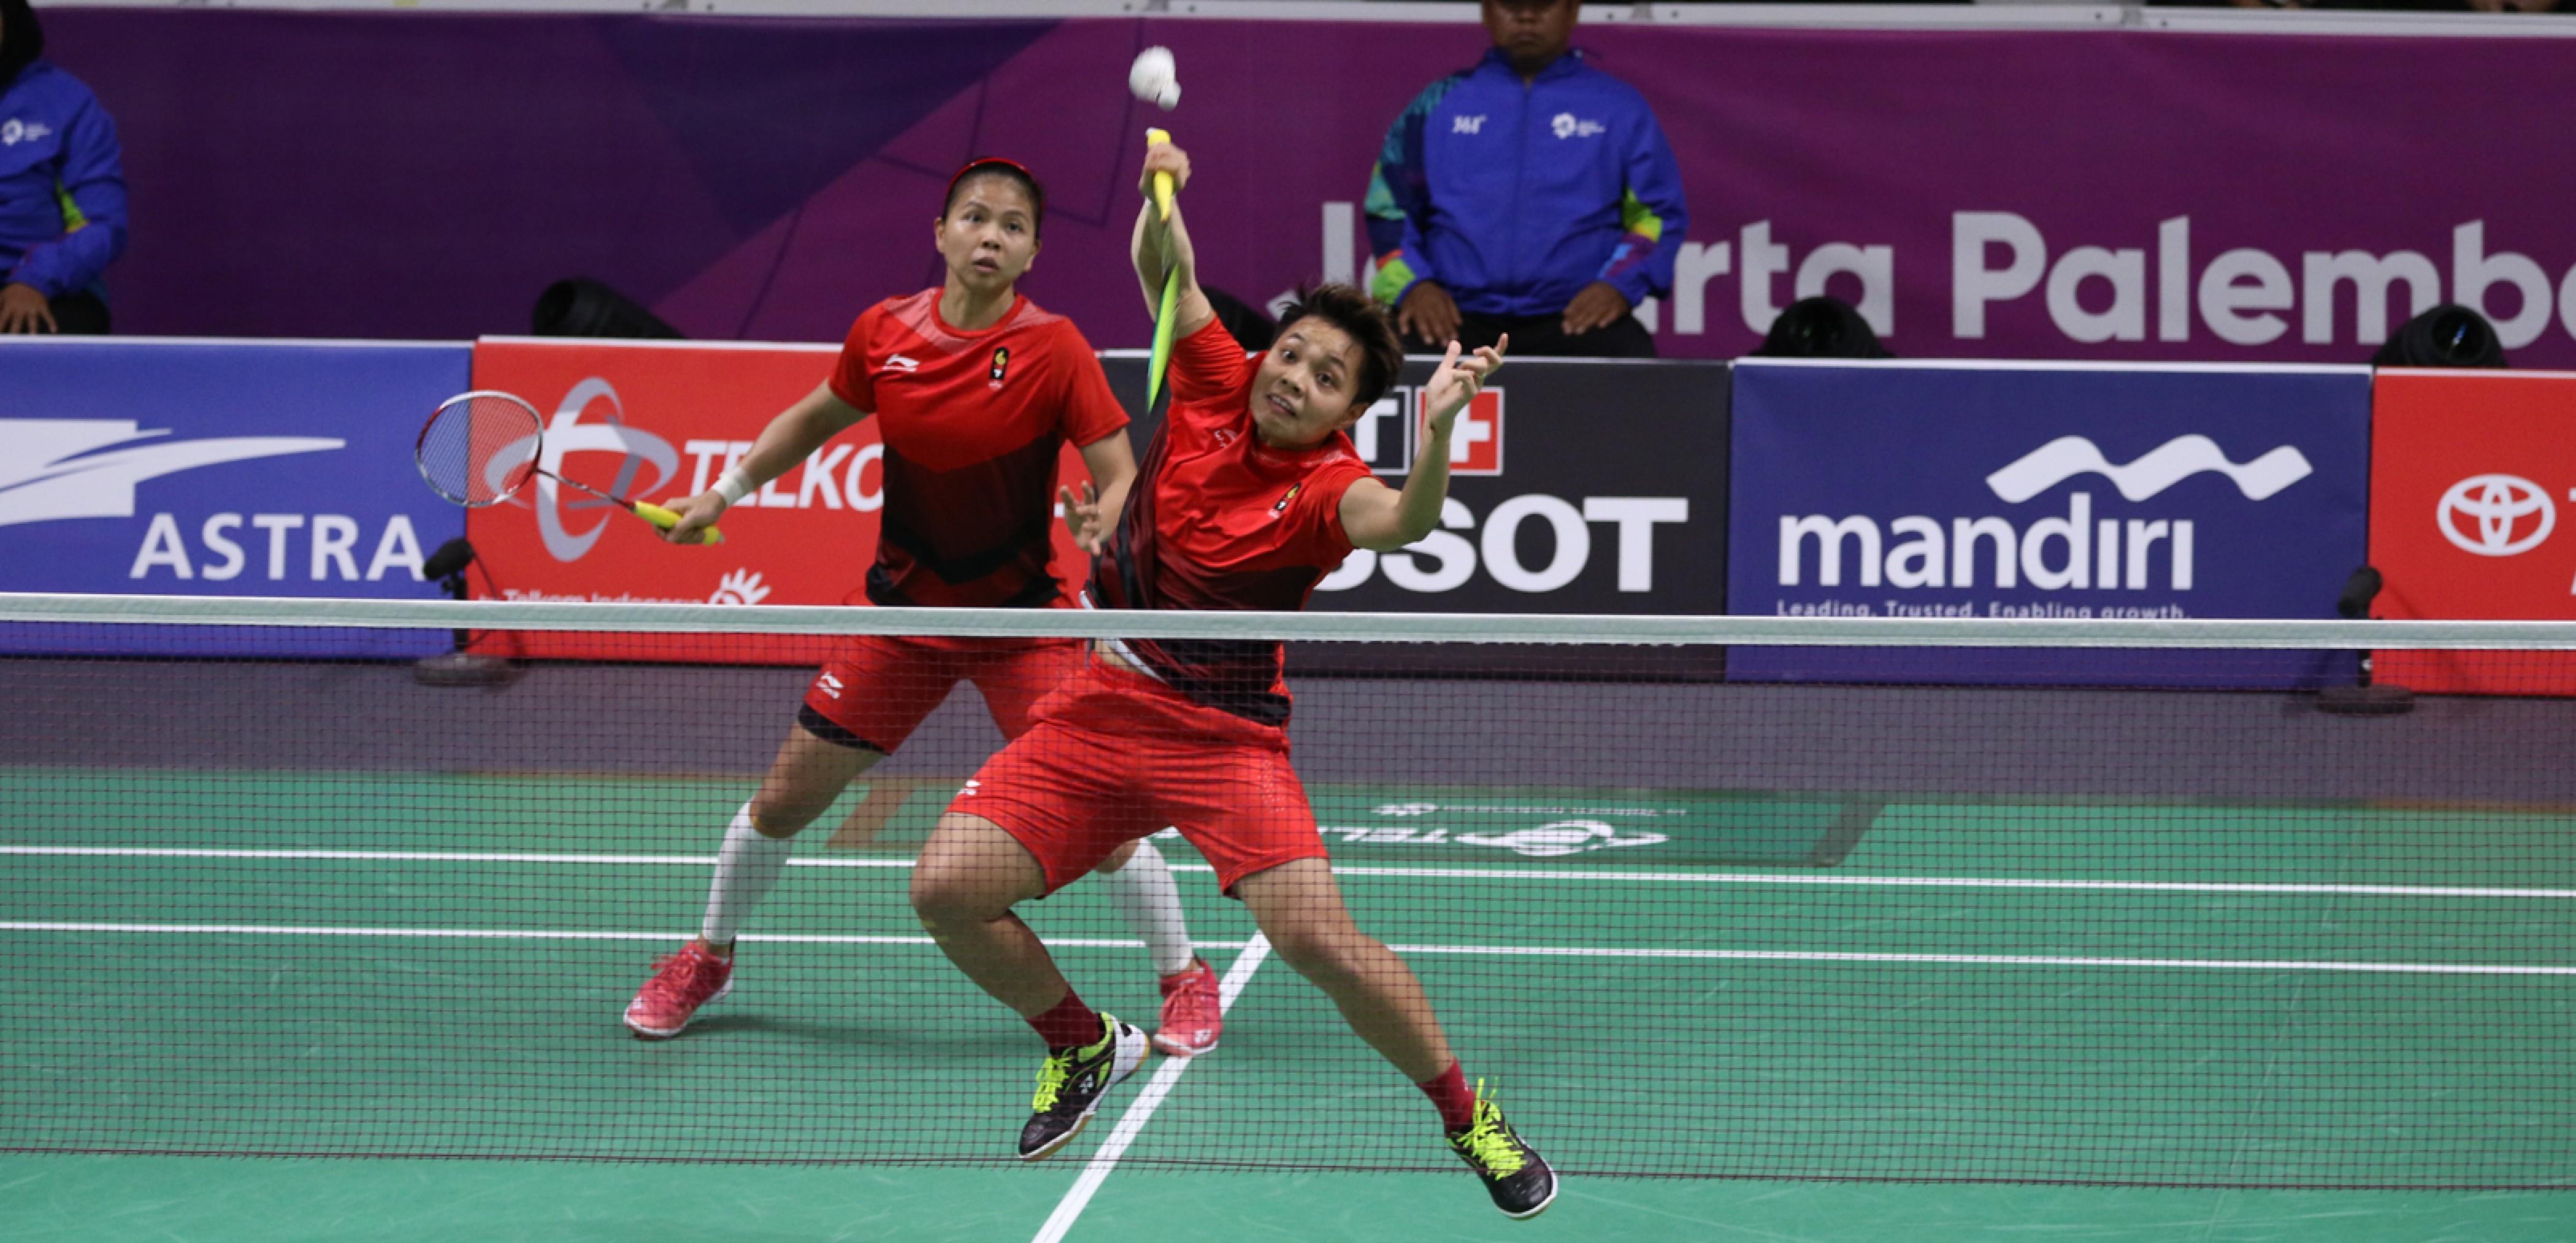 Dua Wakil Indonesia Melaju ke Semfinal Japan Open 2018